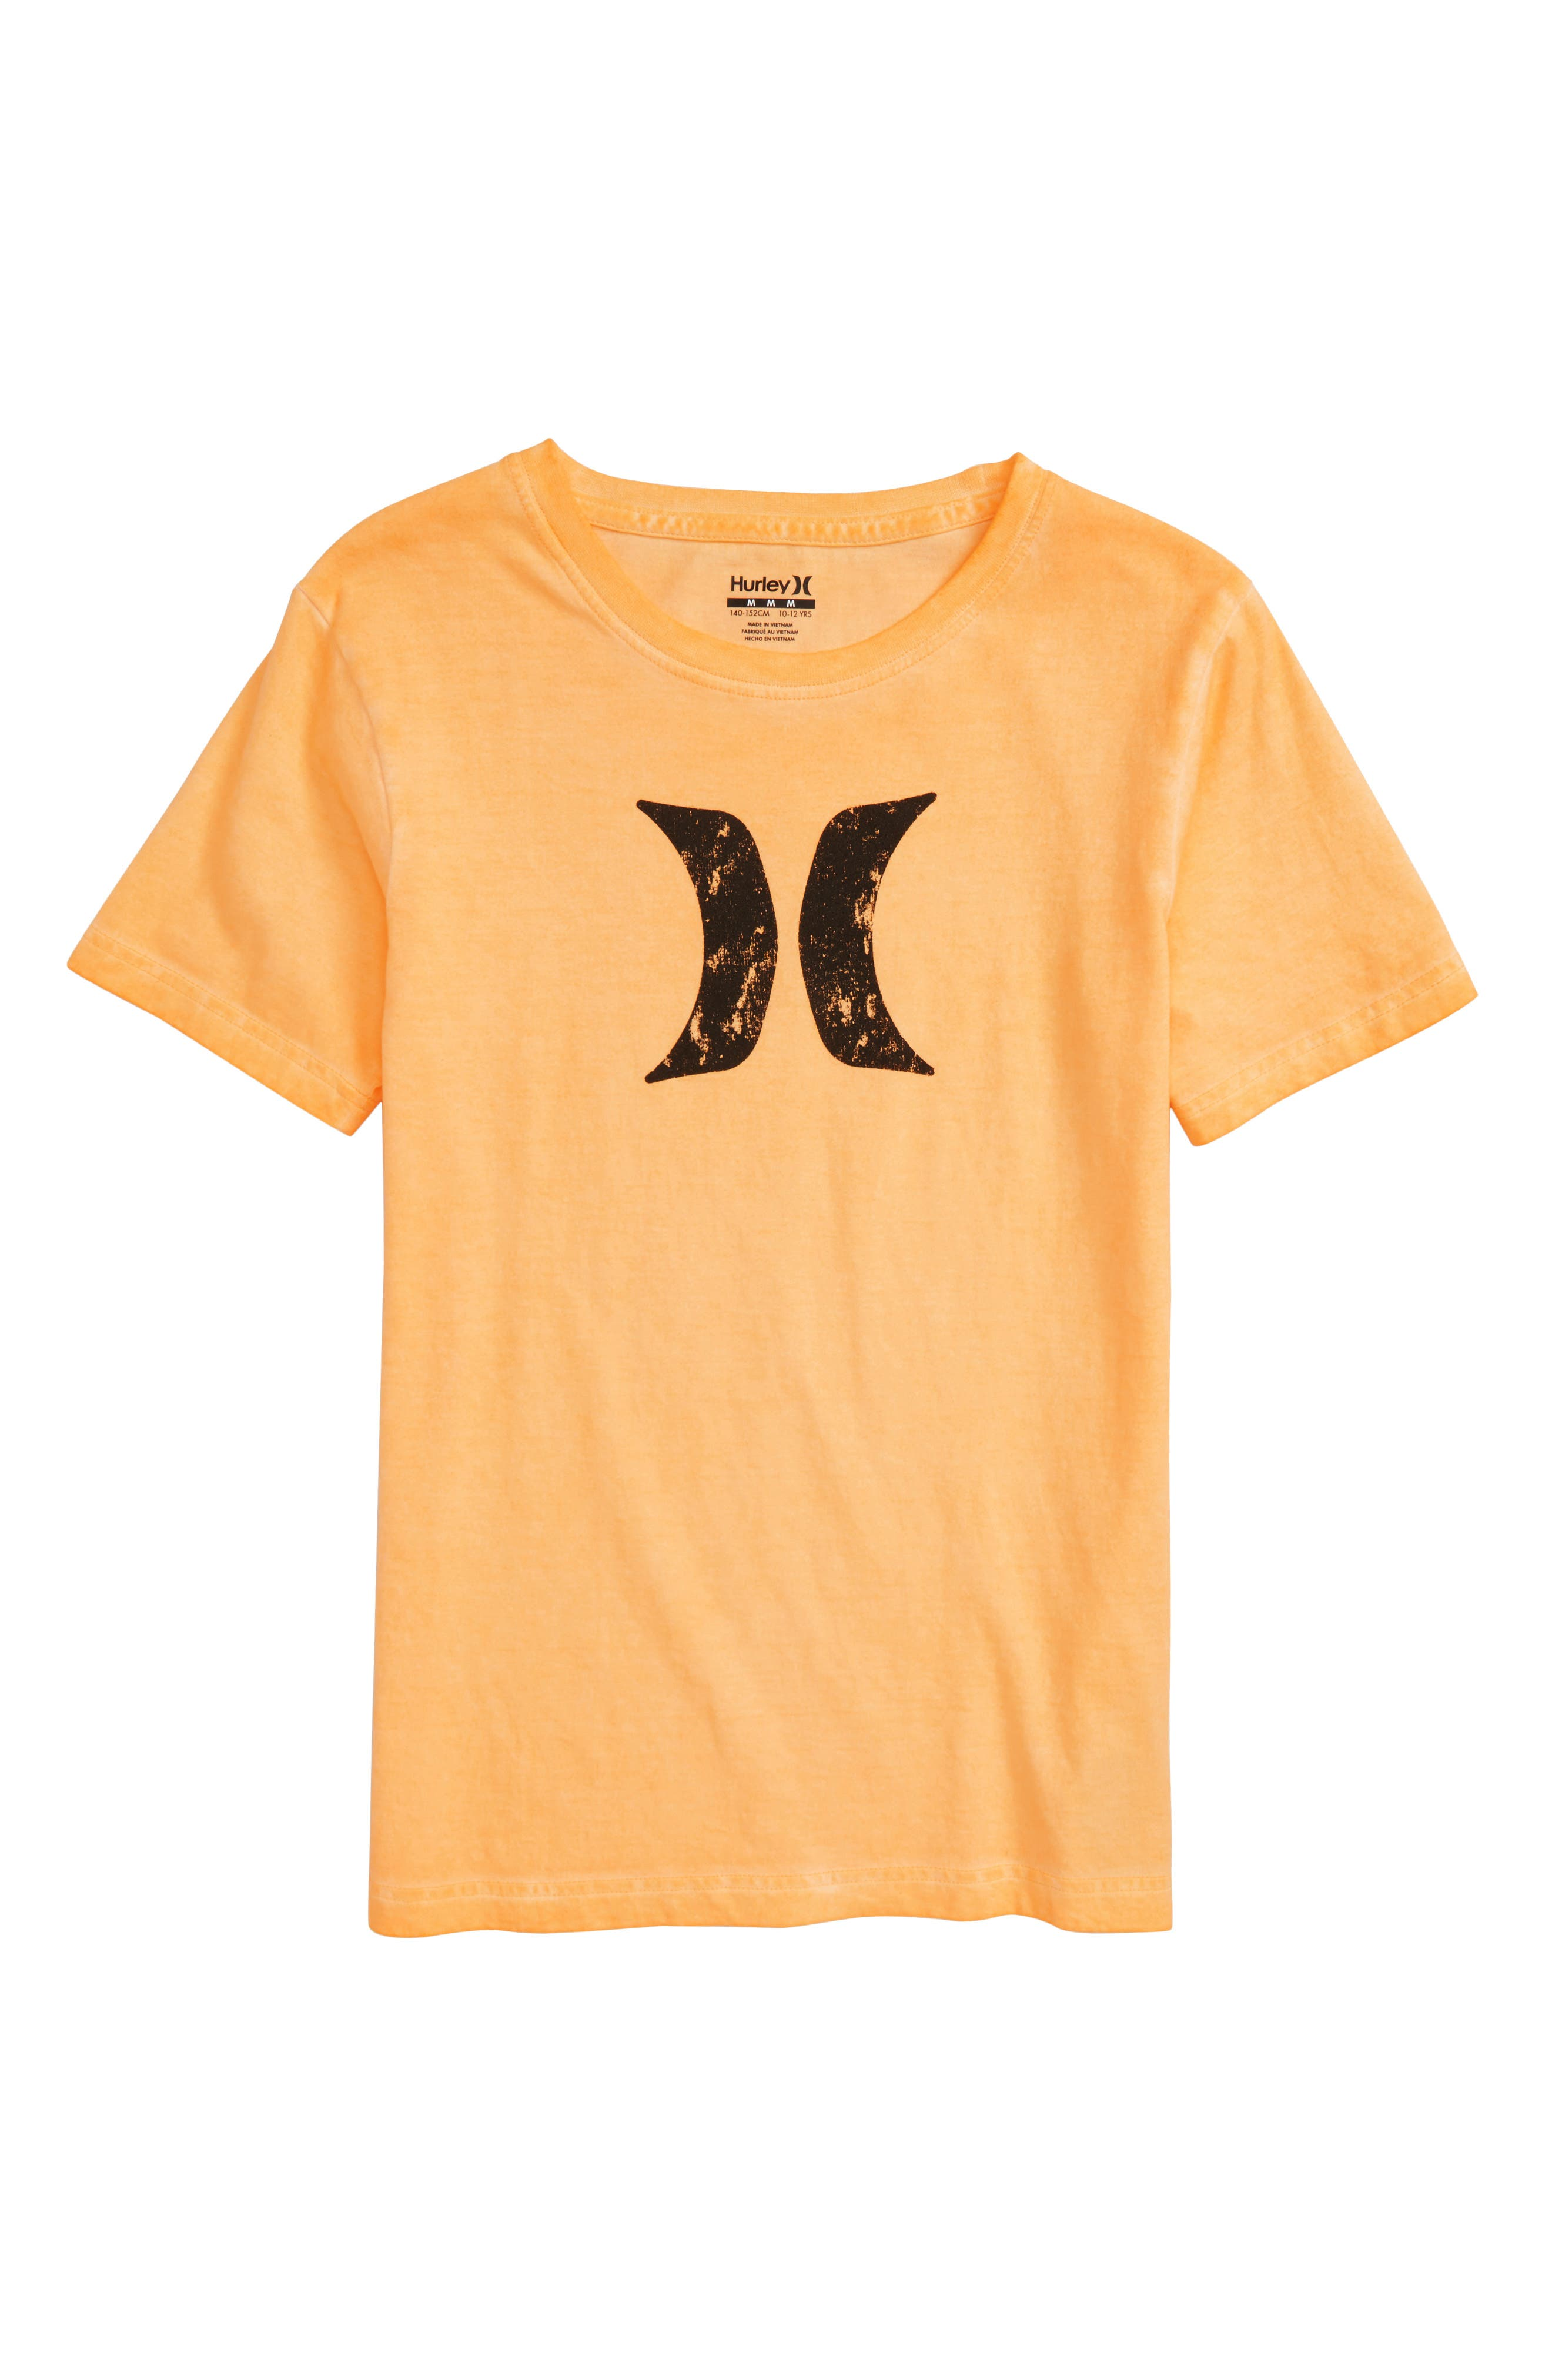 Hurley Destroy Graphic T-Shirt (Big Boys)